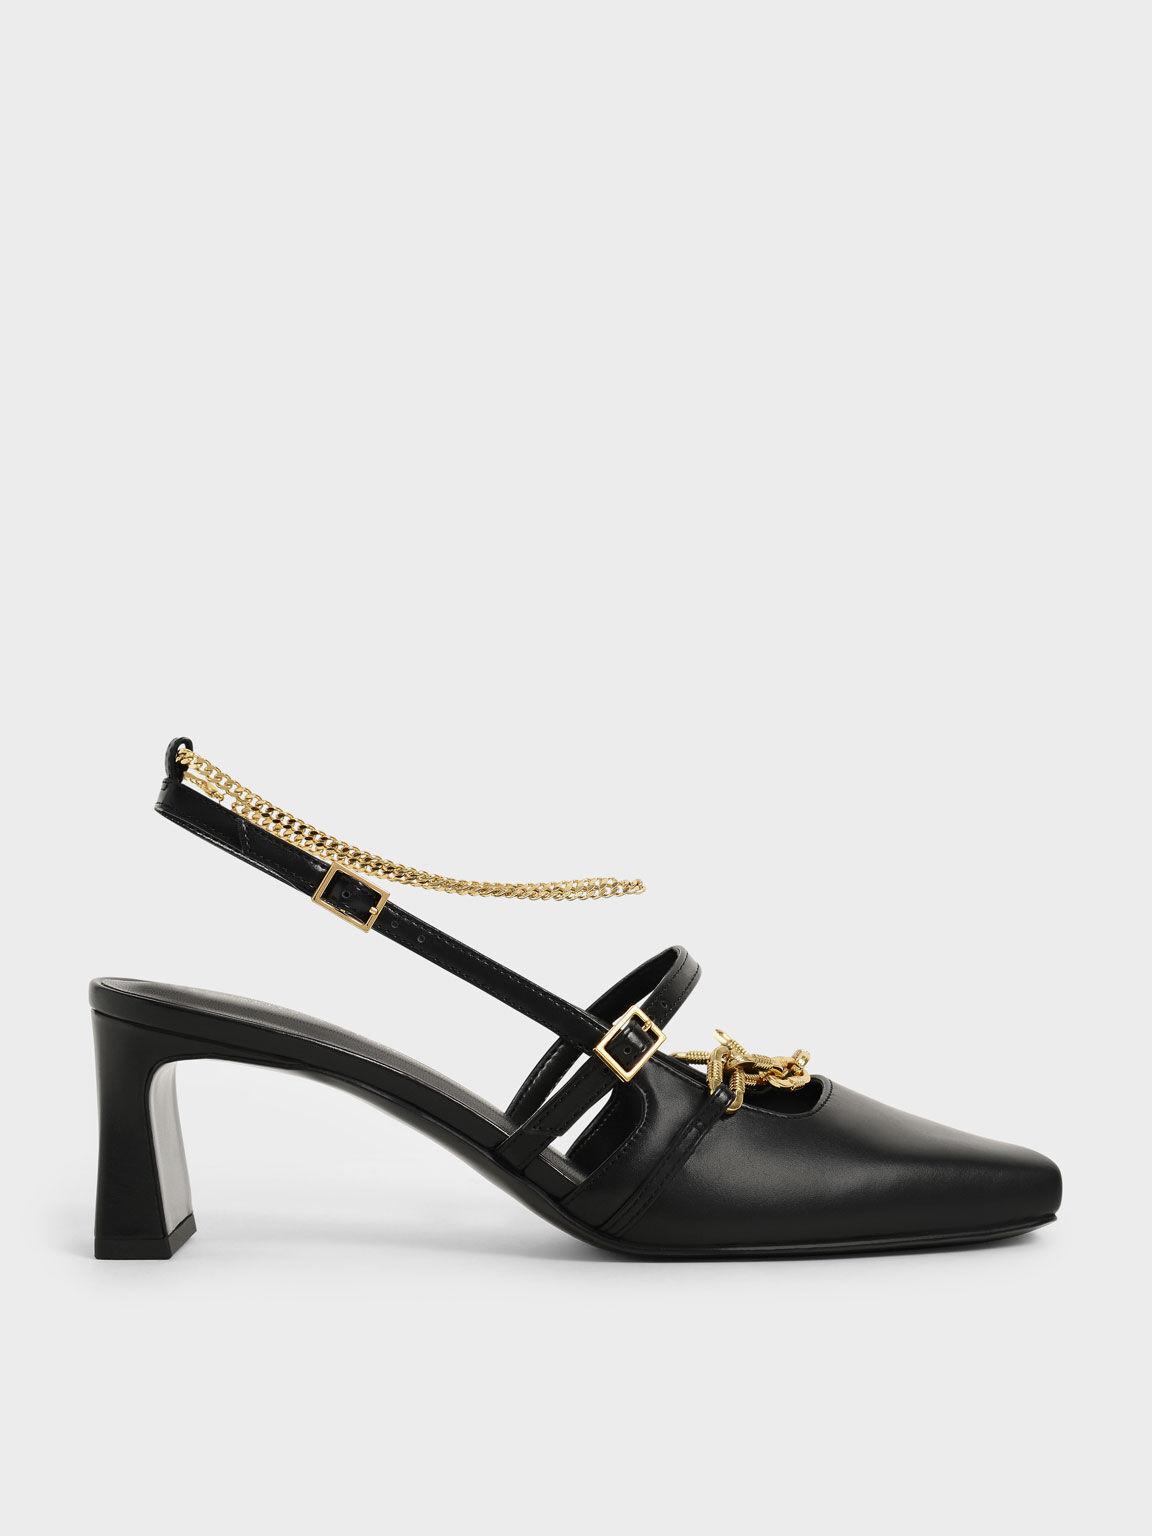 個性粗鍊方頭跟鞋, 黑色, hi-res